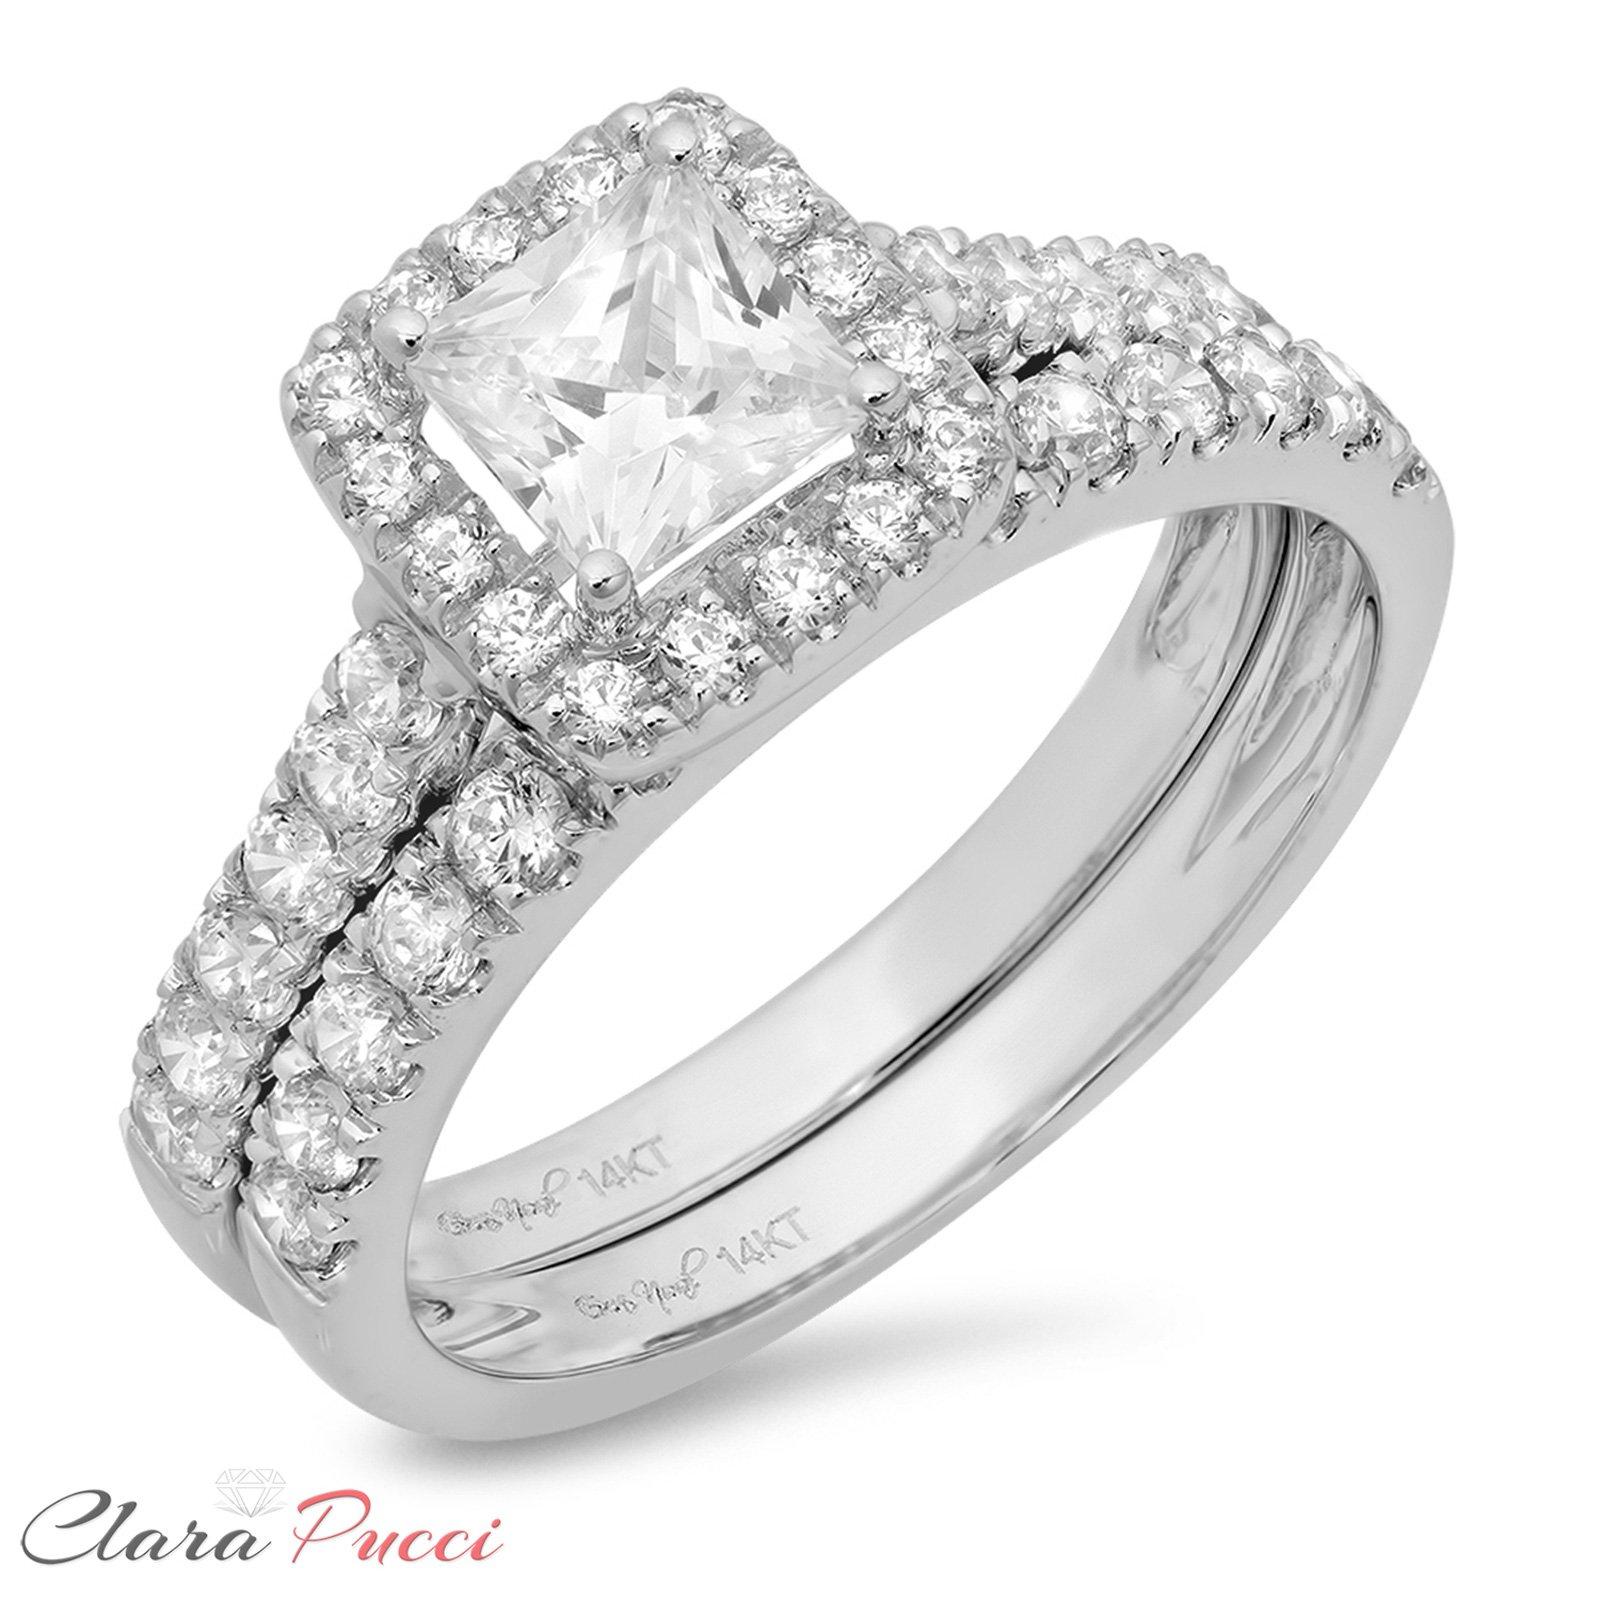 Clara Pucci 1.60 CT Princess Cut CZ Pave Halo Bridal Engagement Wedding Ring Band Set 14k White Gold, Size 8.5 by Clara Pucci (Image #4)